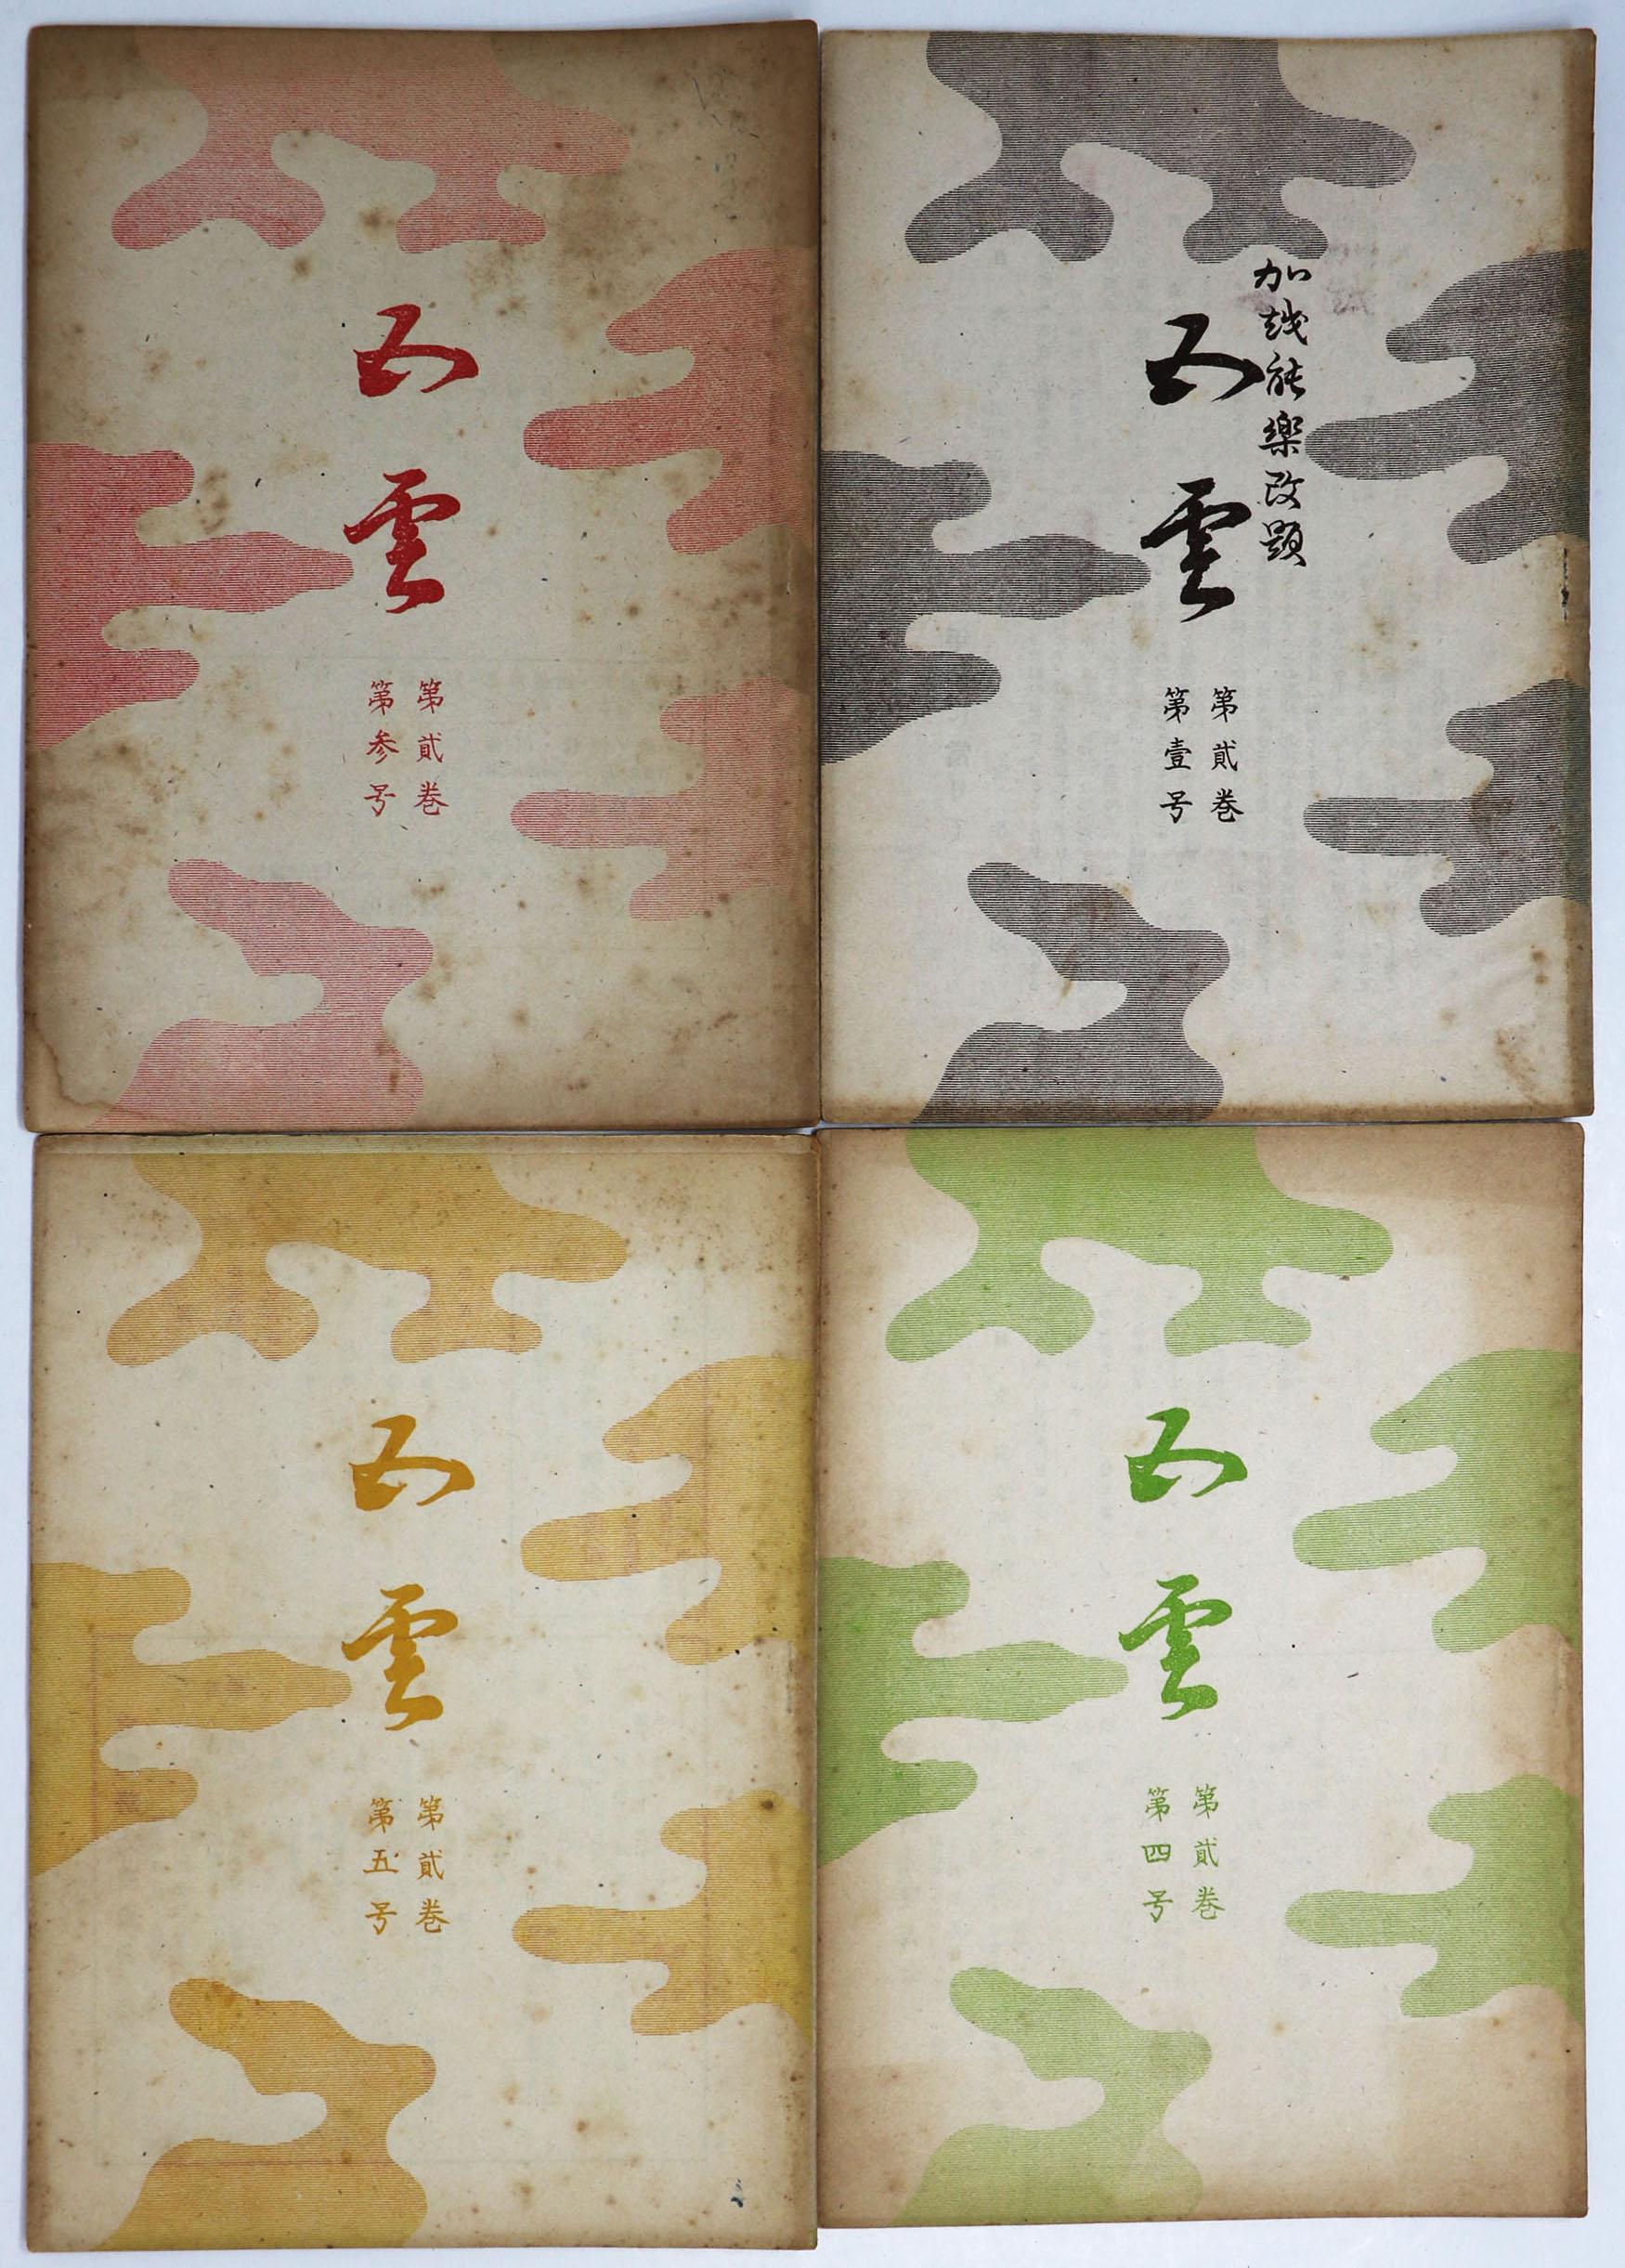 五雲 第2巻3〜5号 4冊